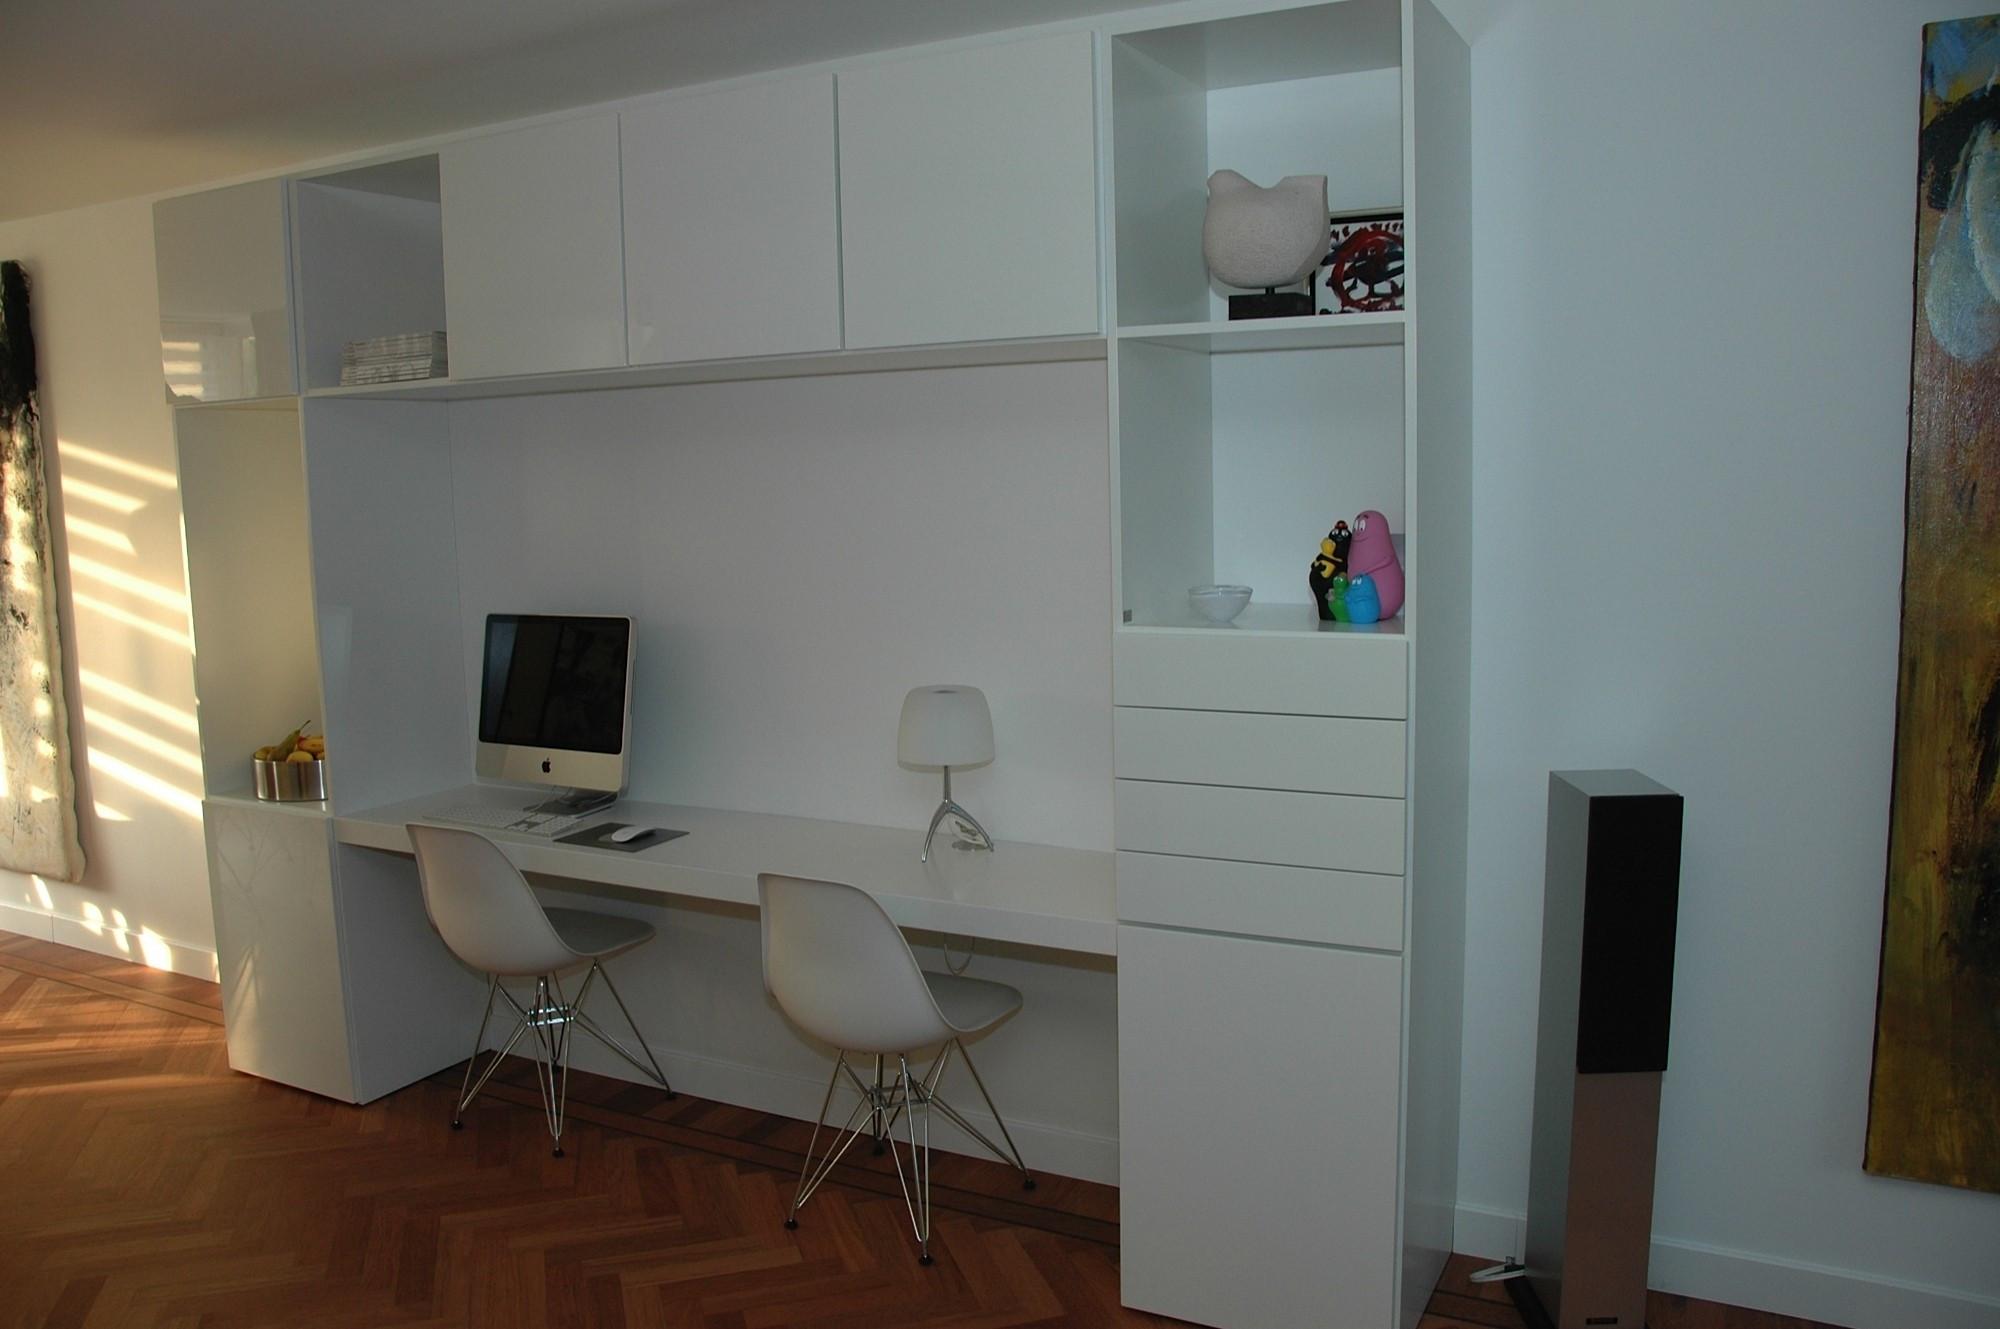 Bureau    wandkast combinatie   PUUR Interiors   PUUR Design  u0026 Interieur